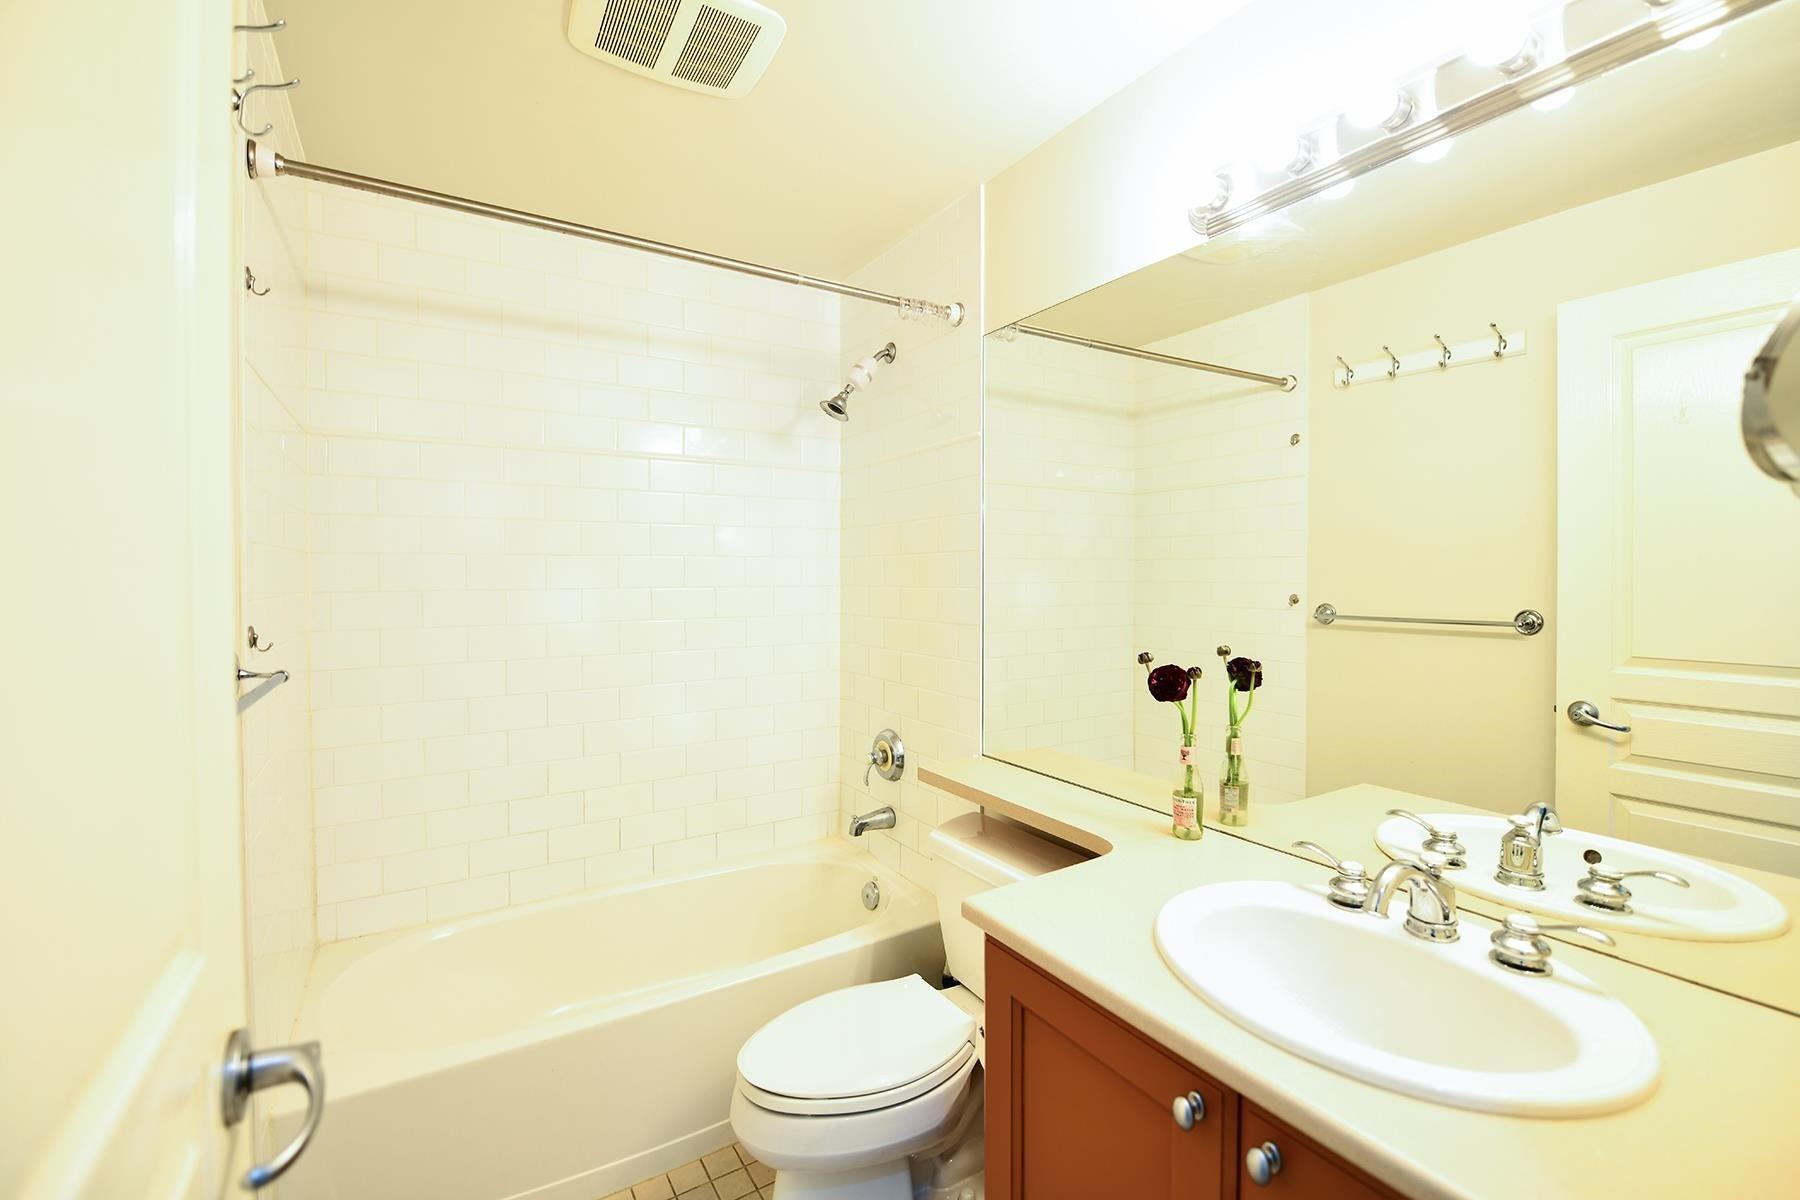 204 5790 EAST BOULEVARD - Kerrisdale Apartment/Condo for sale, 3 Bedrooms (R2604138) - #18